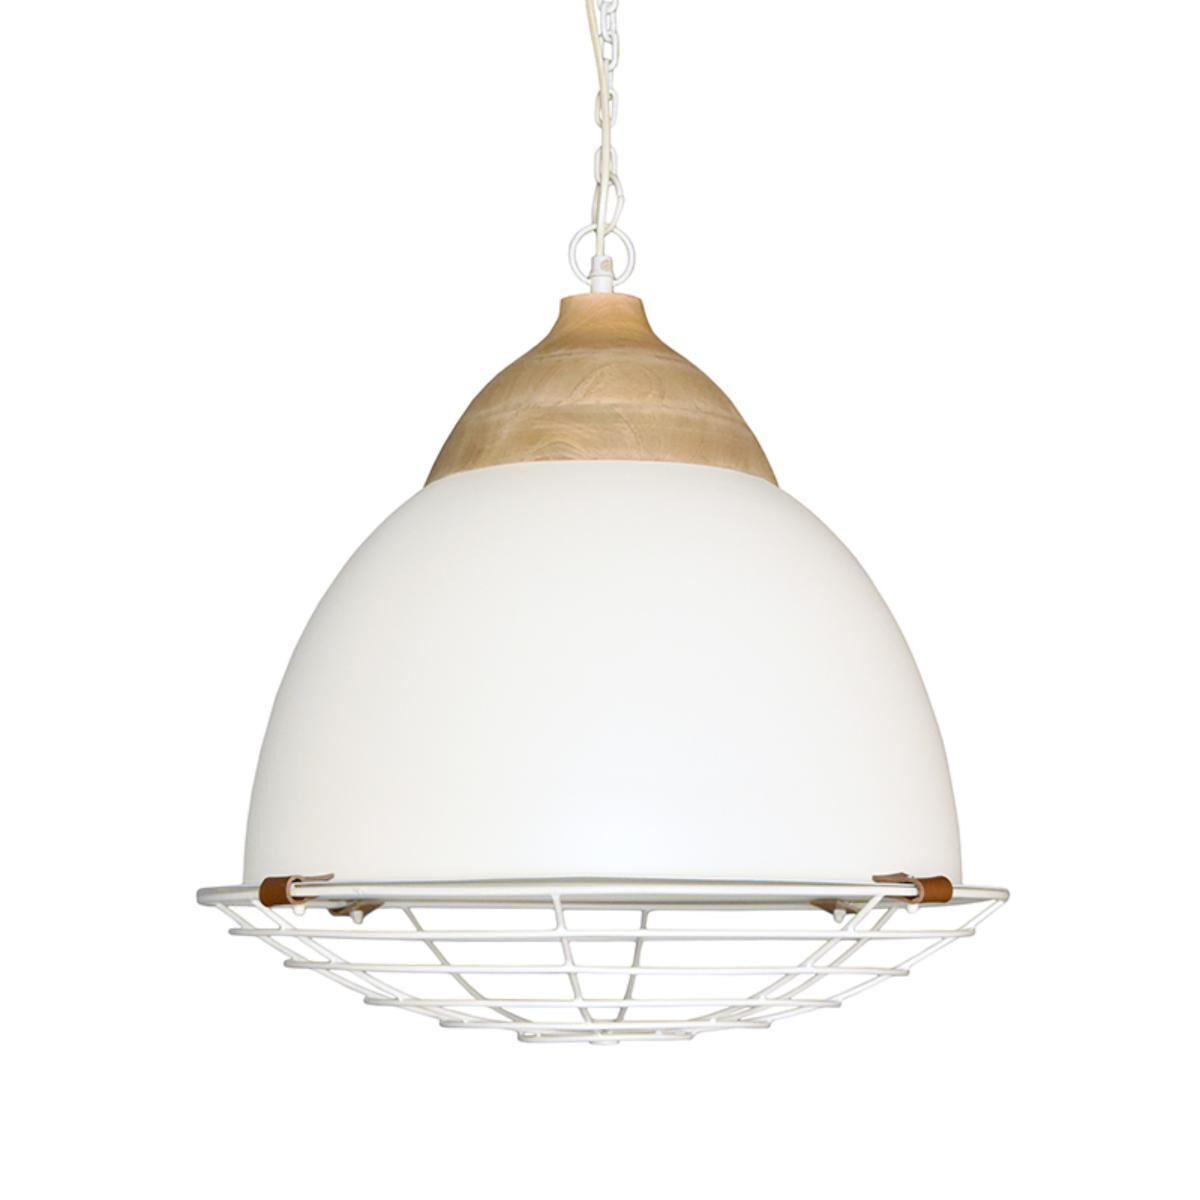 LABEL51 hanglamp 'Rootz' 50x50x43 cm